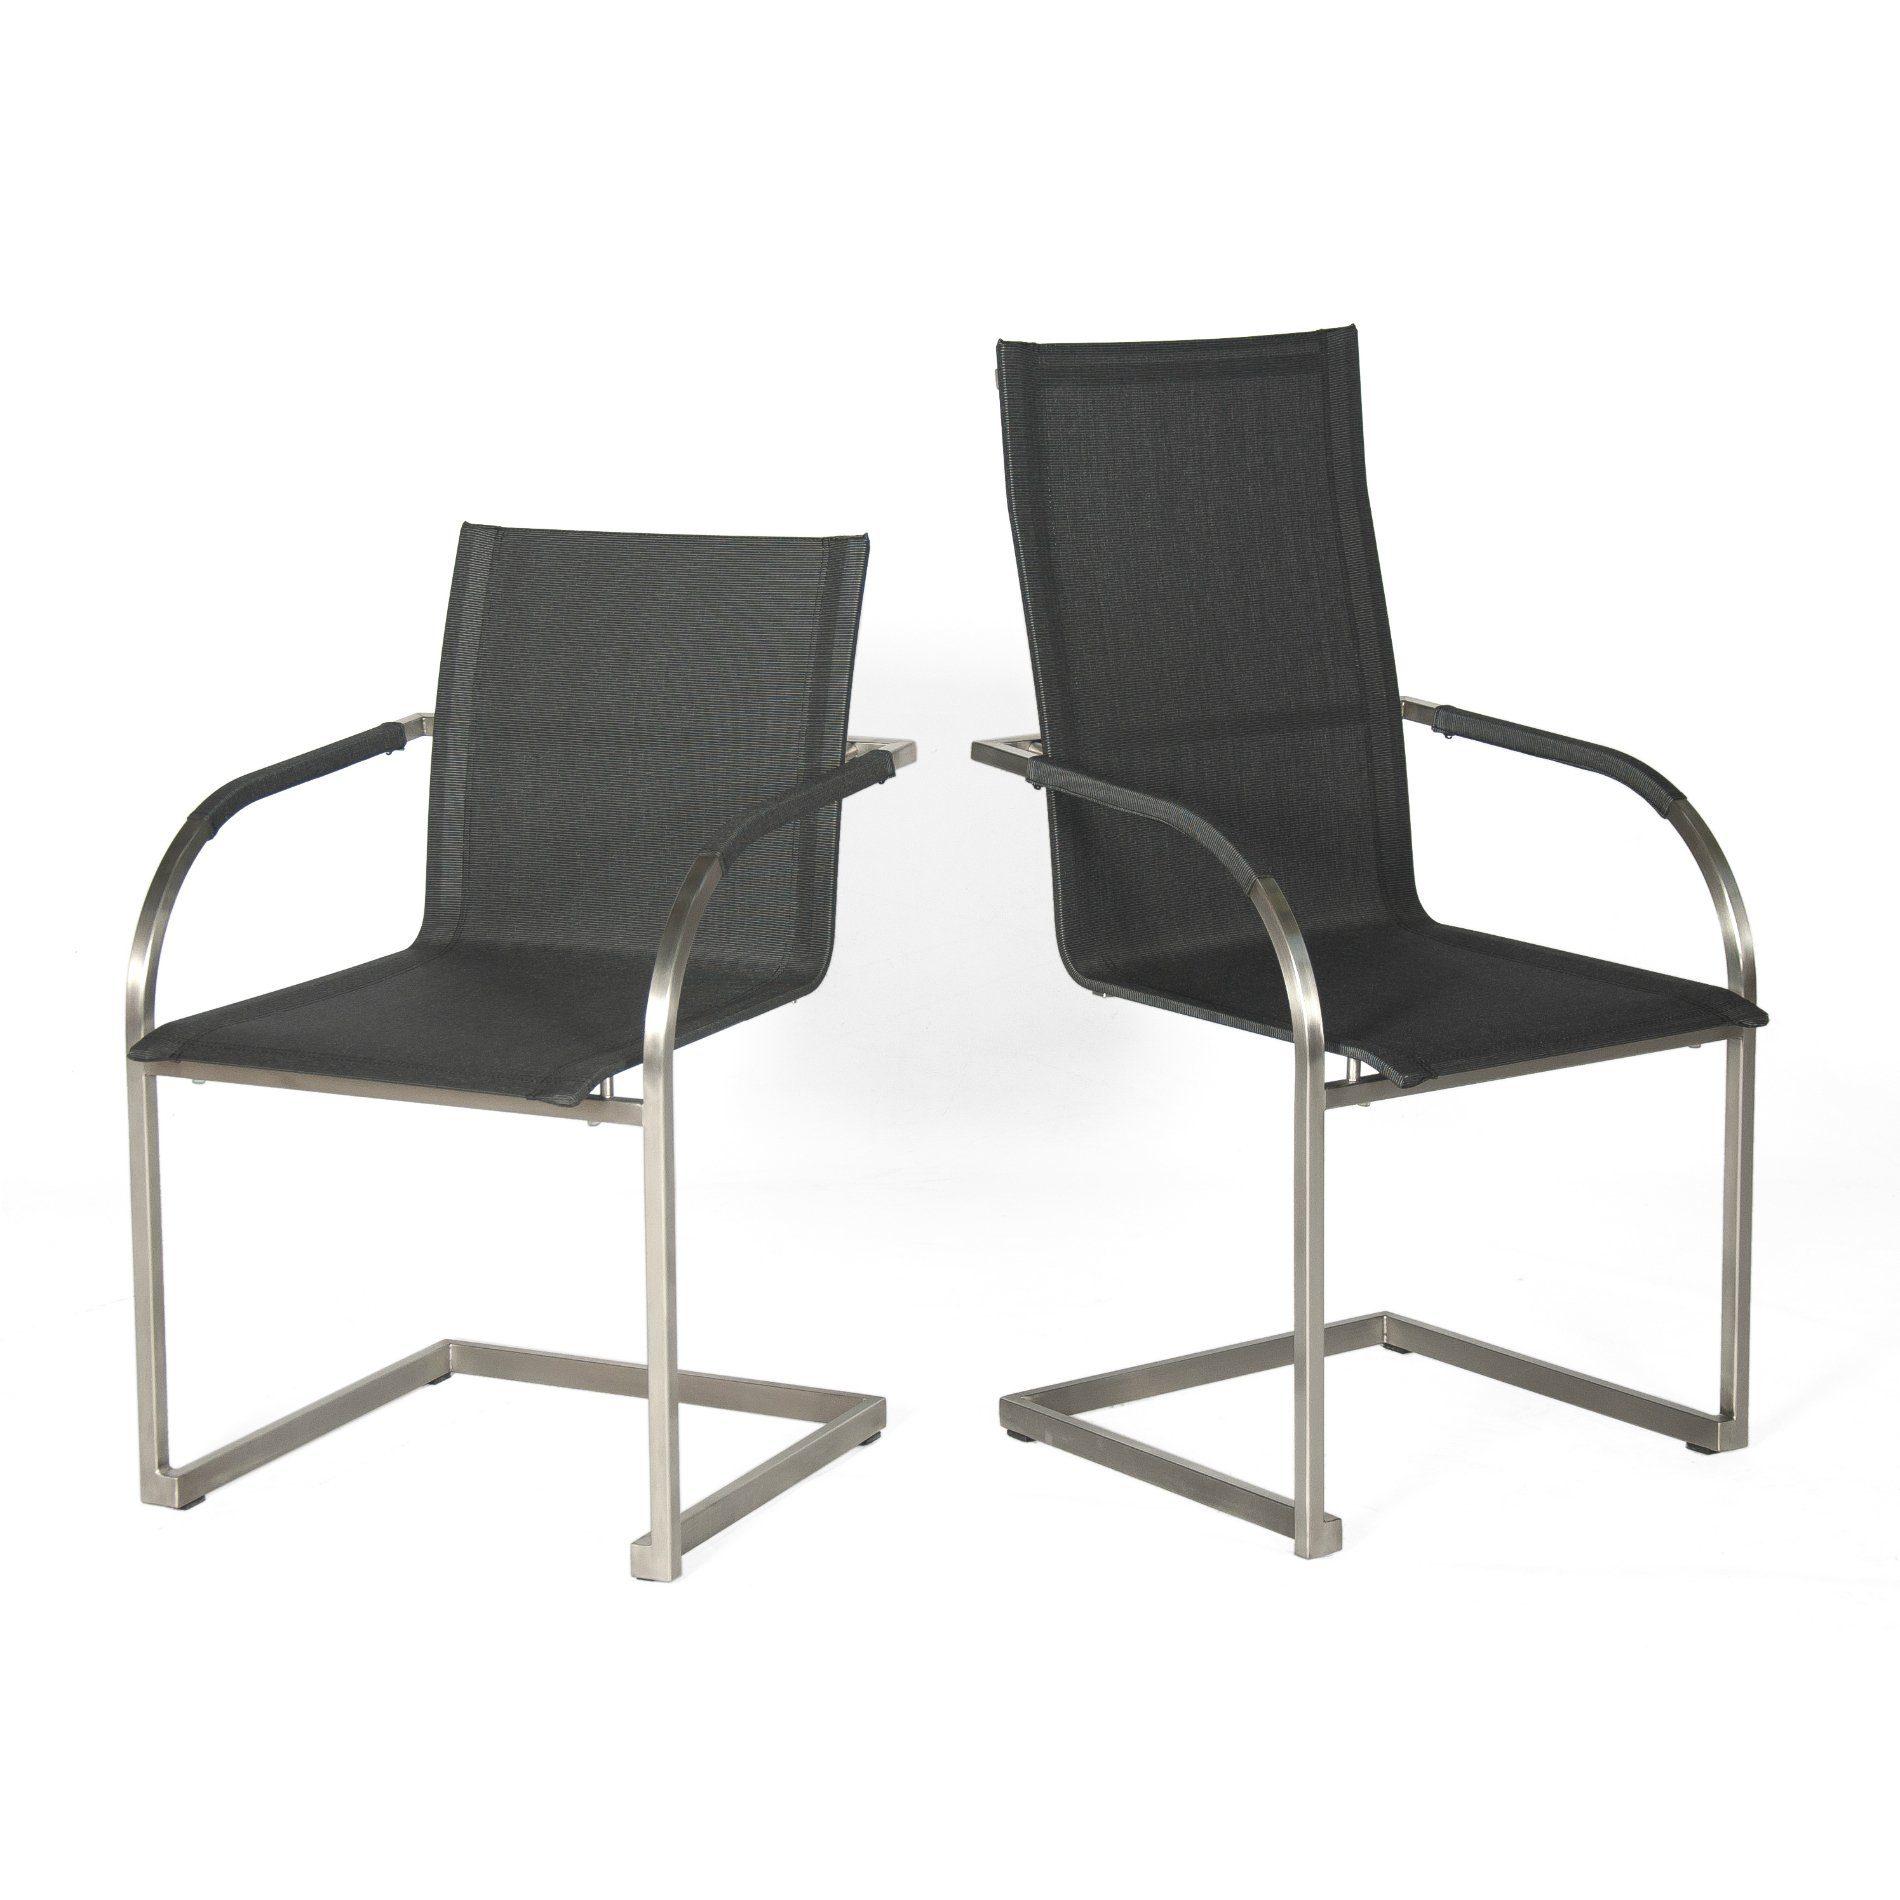 sonnenpartner infinity freischwinger hoch. Black Bedroom Furniture Sets. Home Design Ideas